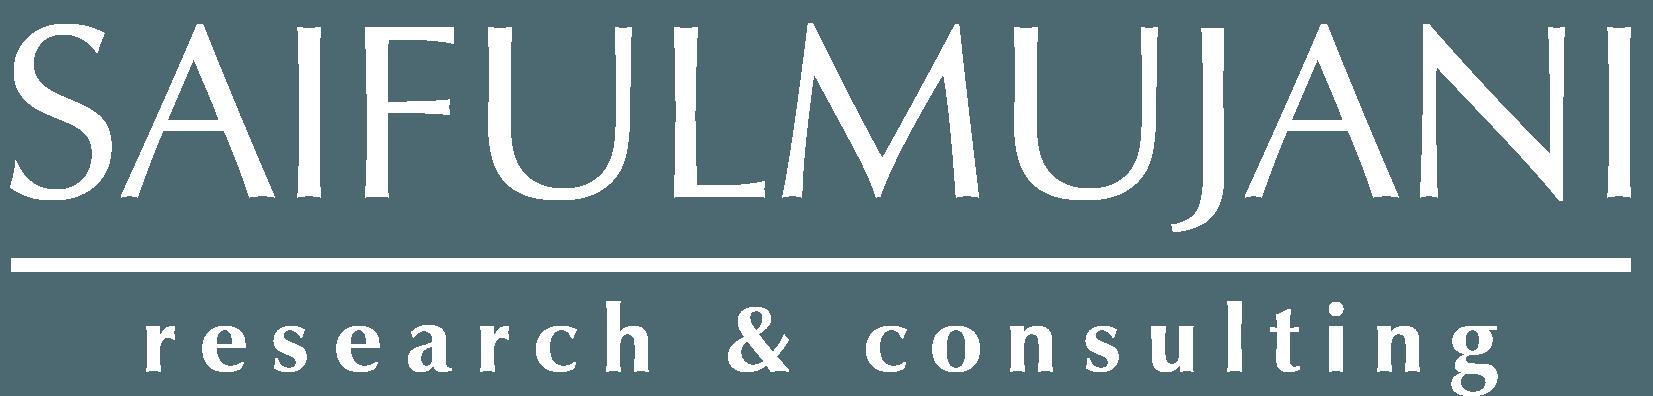 Saiful Mujani Research and Consulting (SMRC)